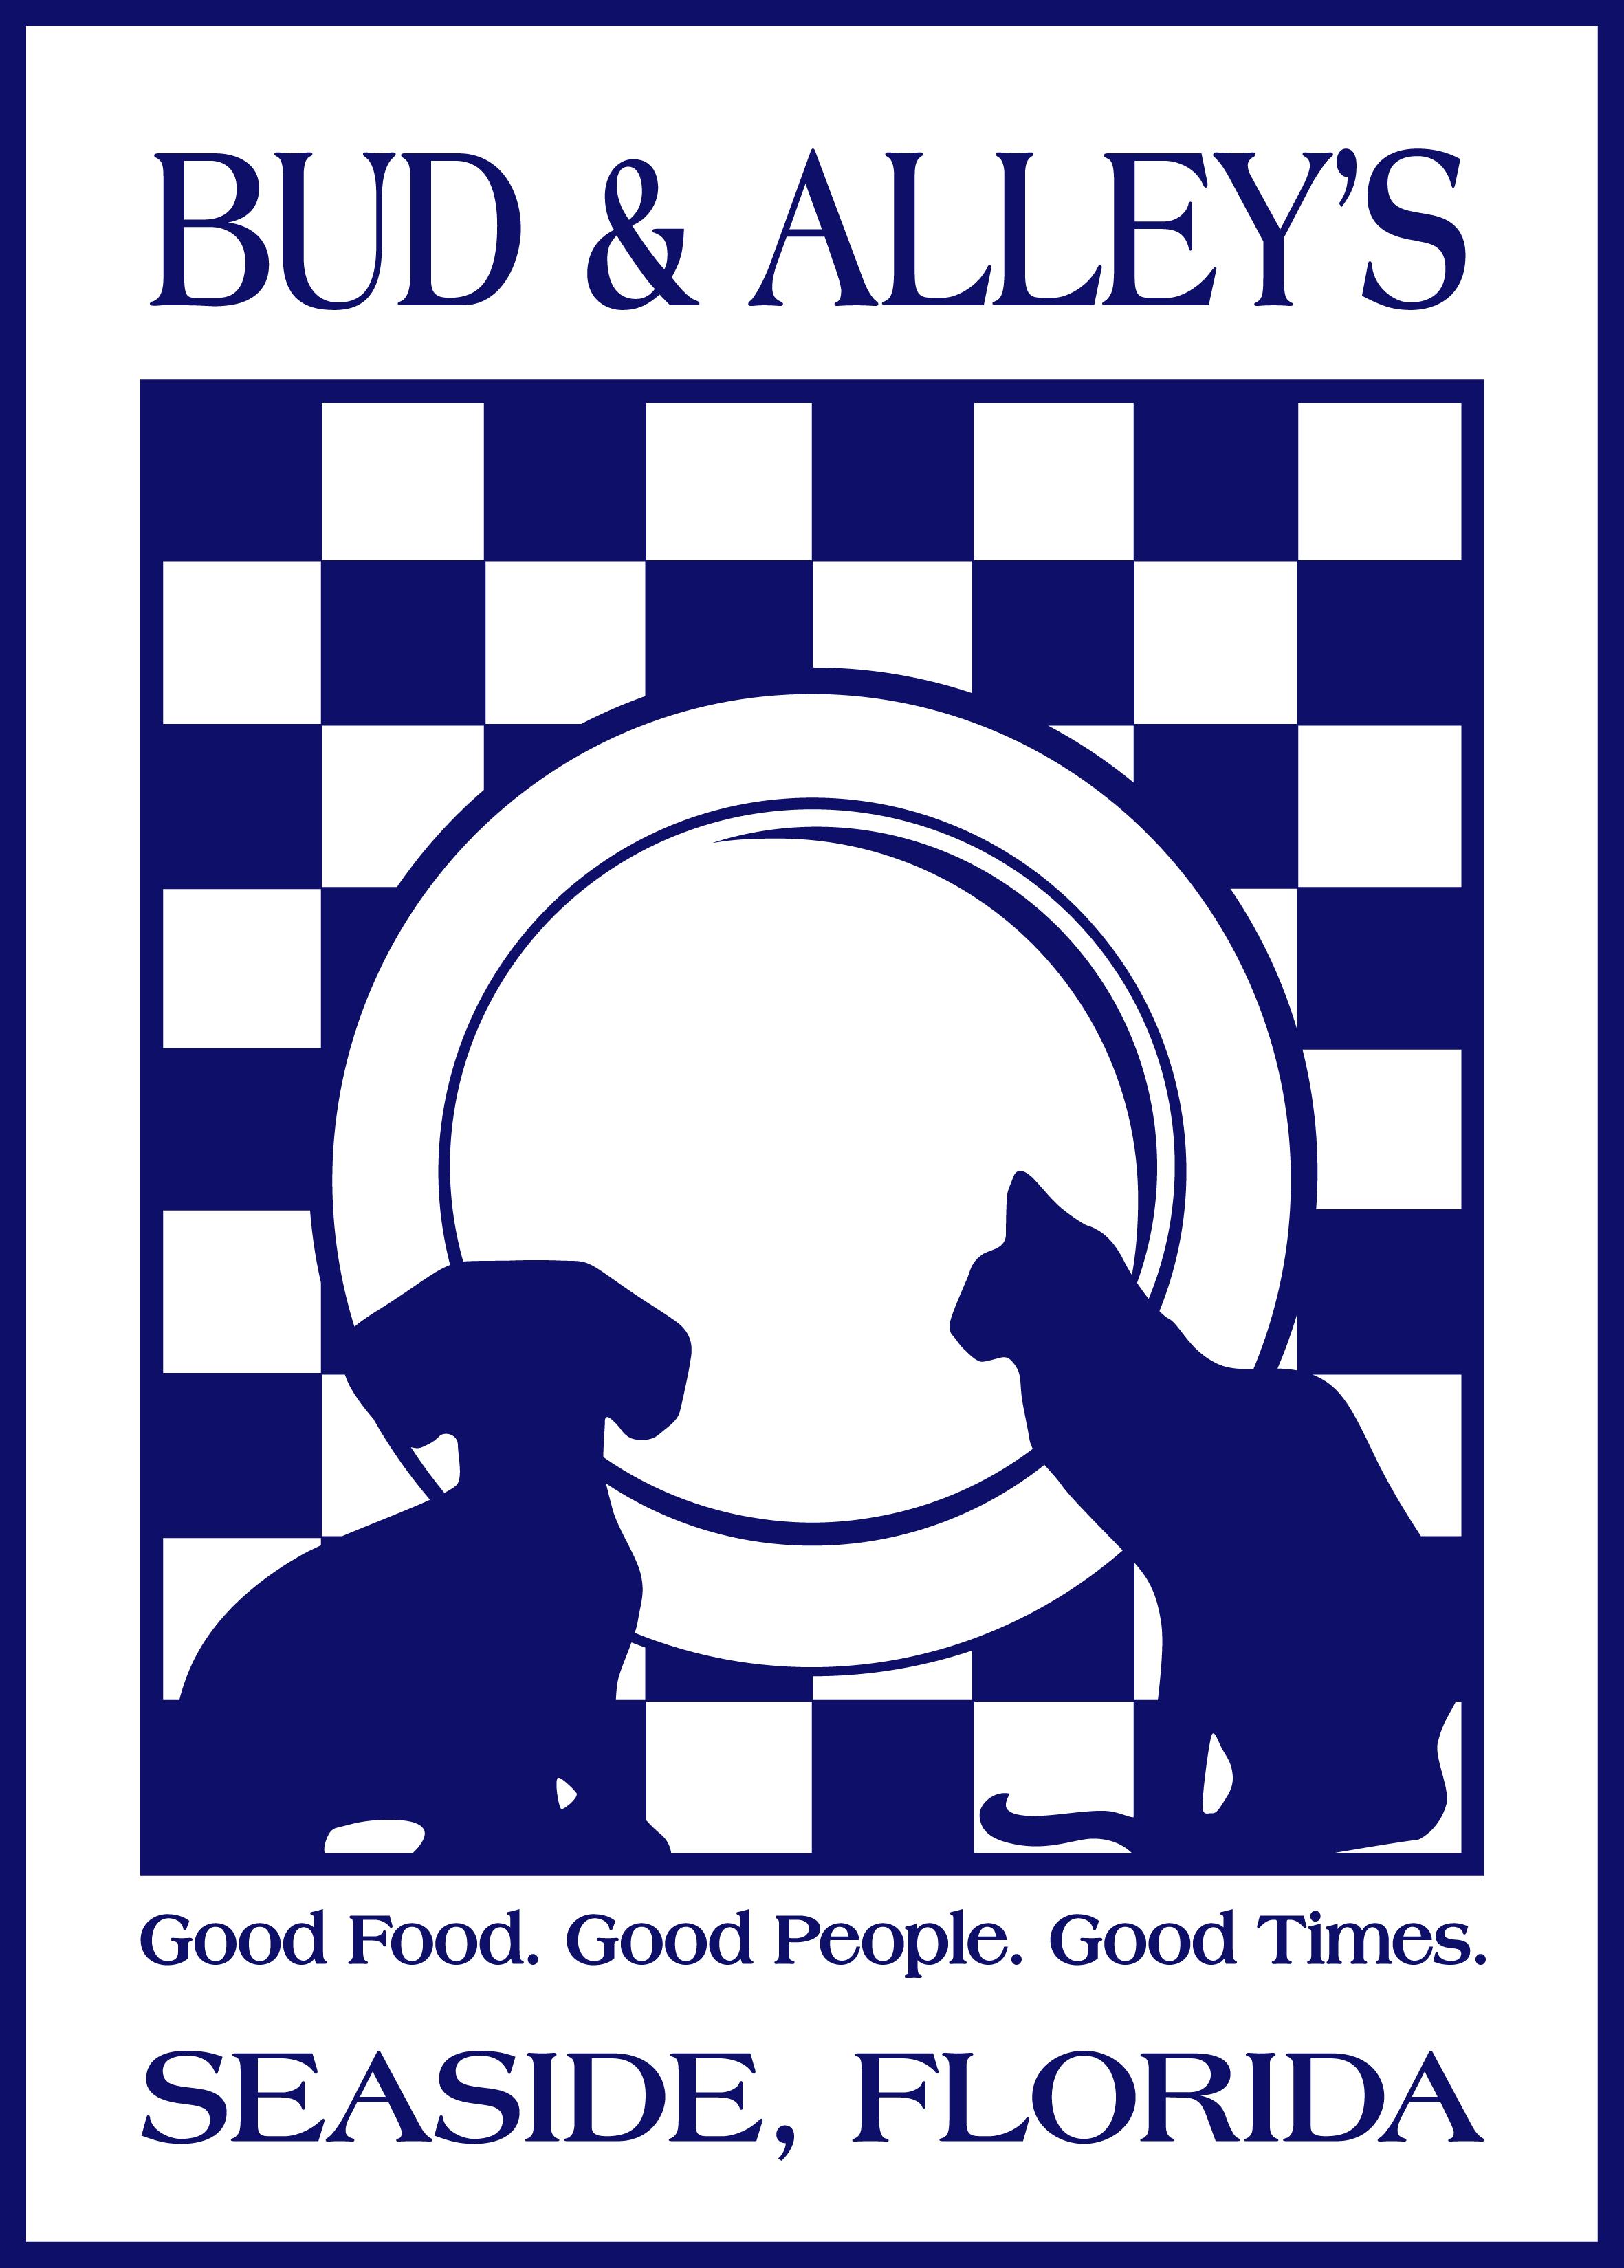 BudAlleys_logo.png